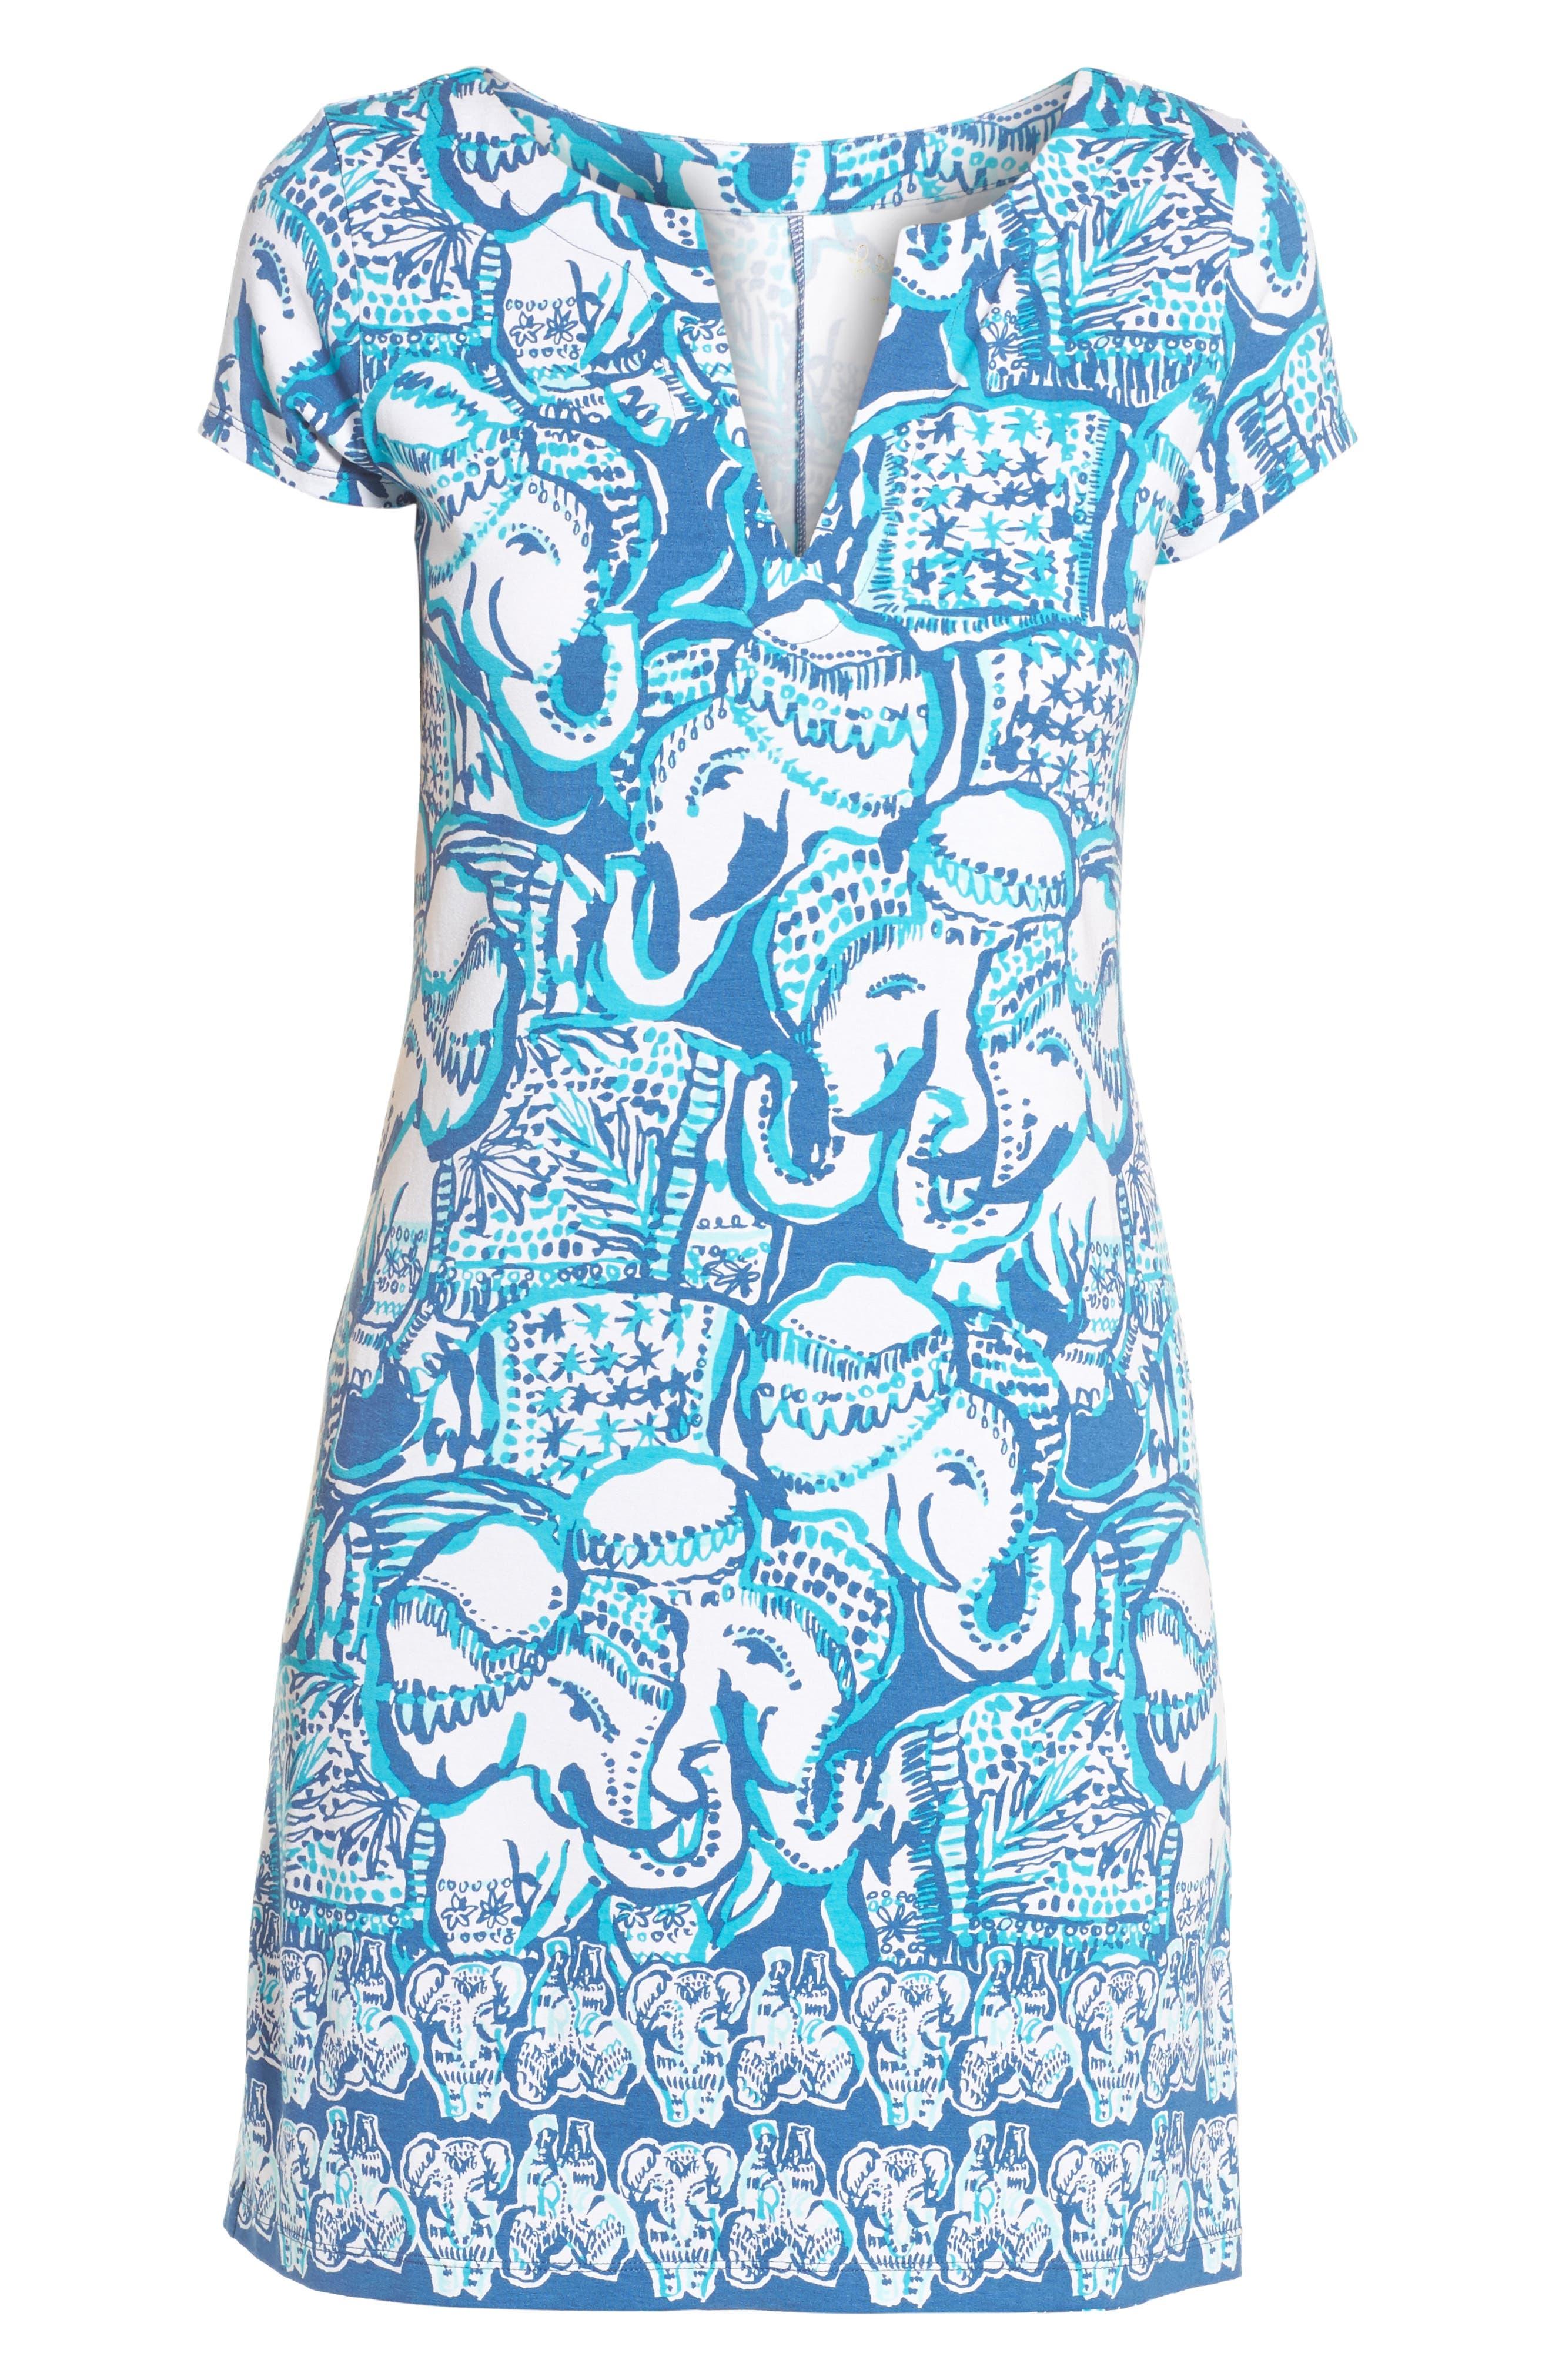 Sophiletta UPF 50+ Dress,                             Alternate thumbnail 6, color,                             Indigo